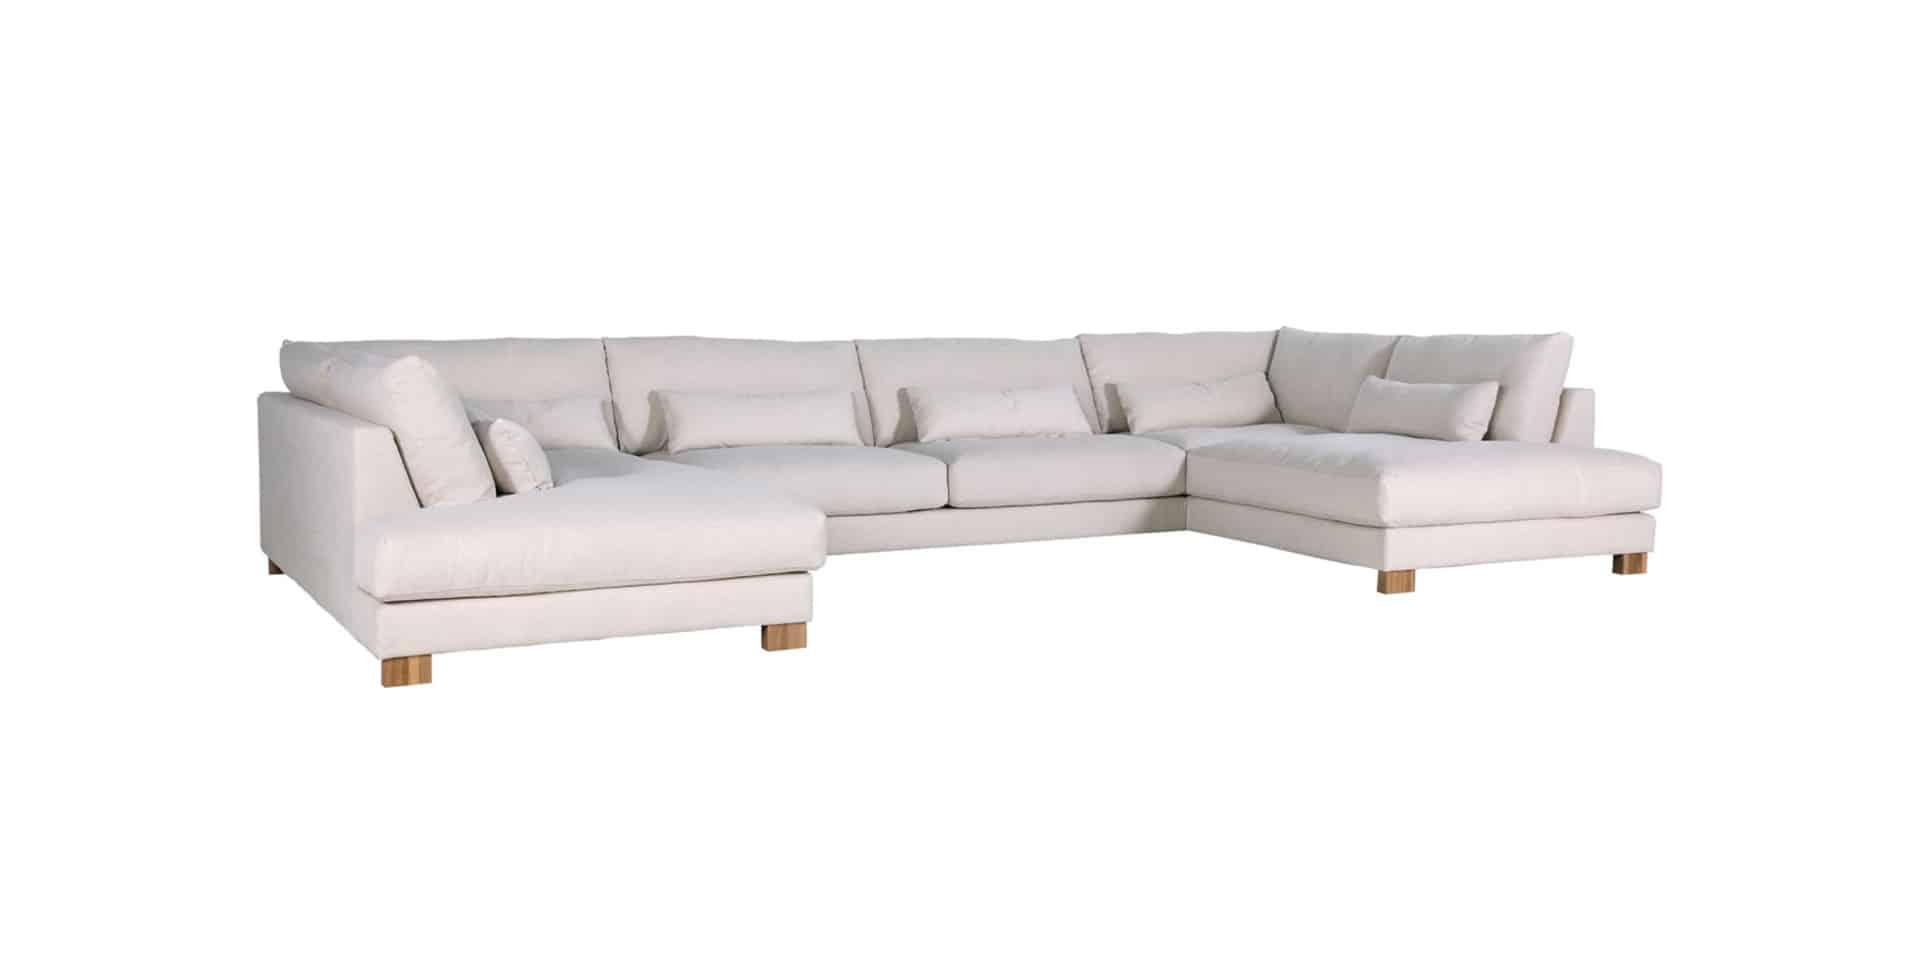 Brandon Corner Sofa From Sits Modular Sofa Mia Stanza